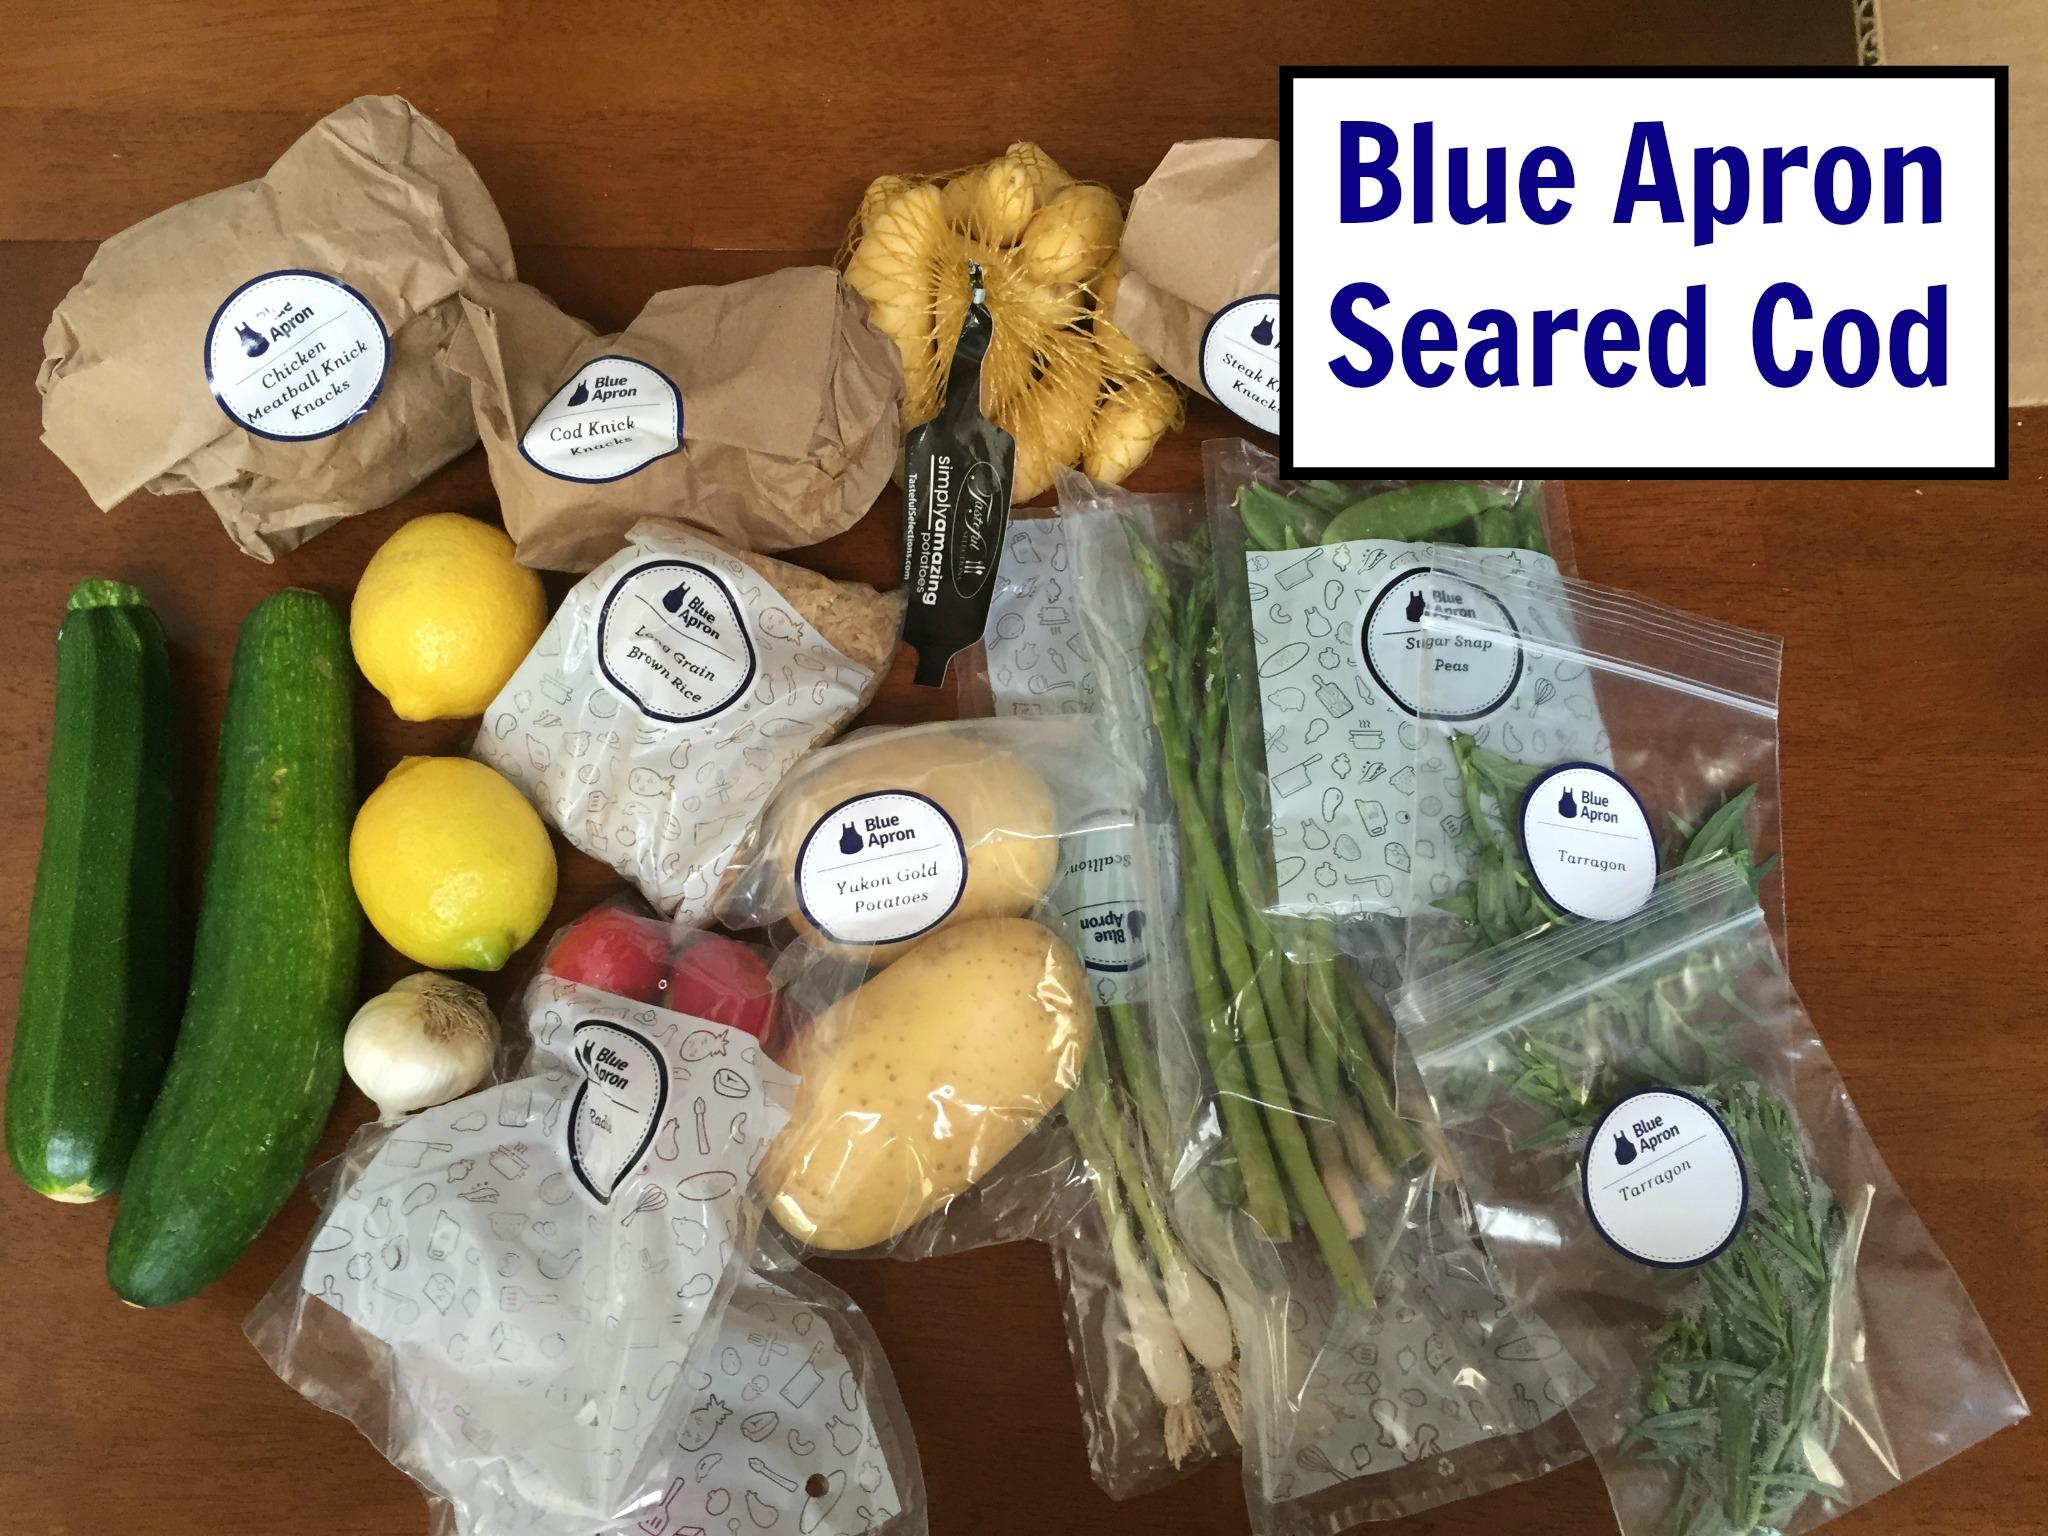 Blue apron vegetarian reviews - Blue Apron Vegetarian Reviews 89